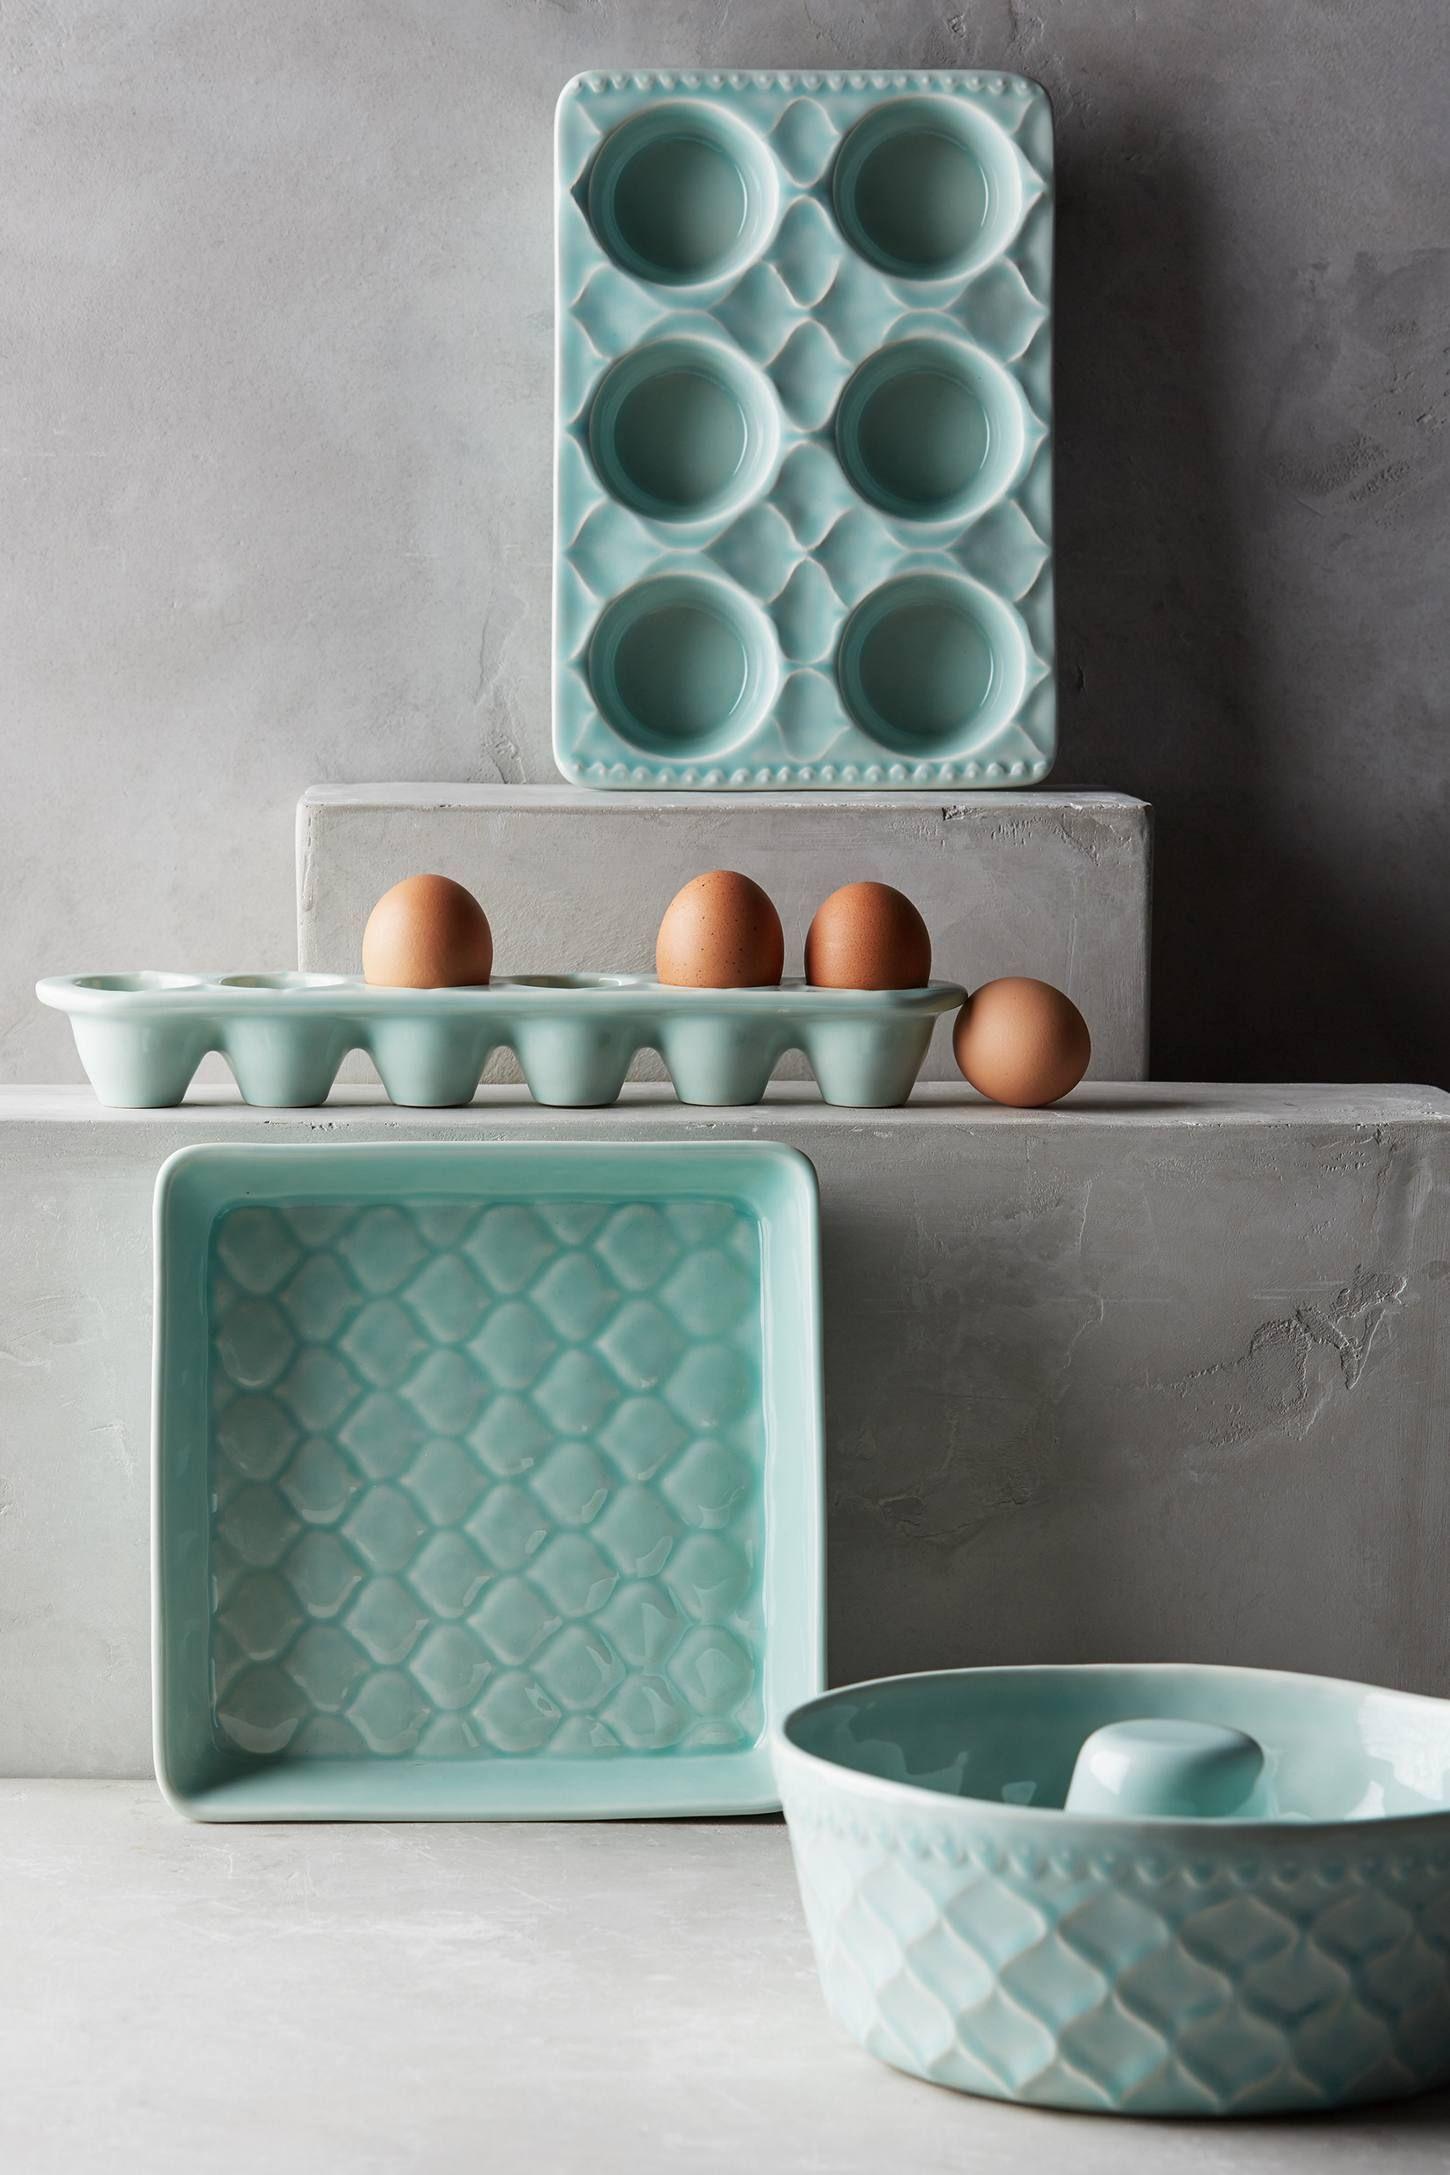 Accessoires Salle De Bain Couleur Aqua ~ patisserie muffin pan anthropologie eu kitchenware pinterest